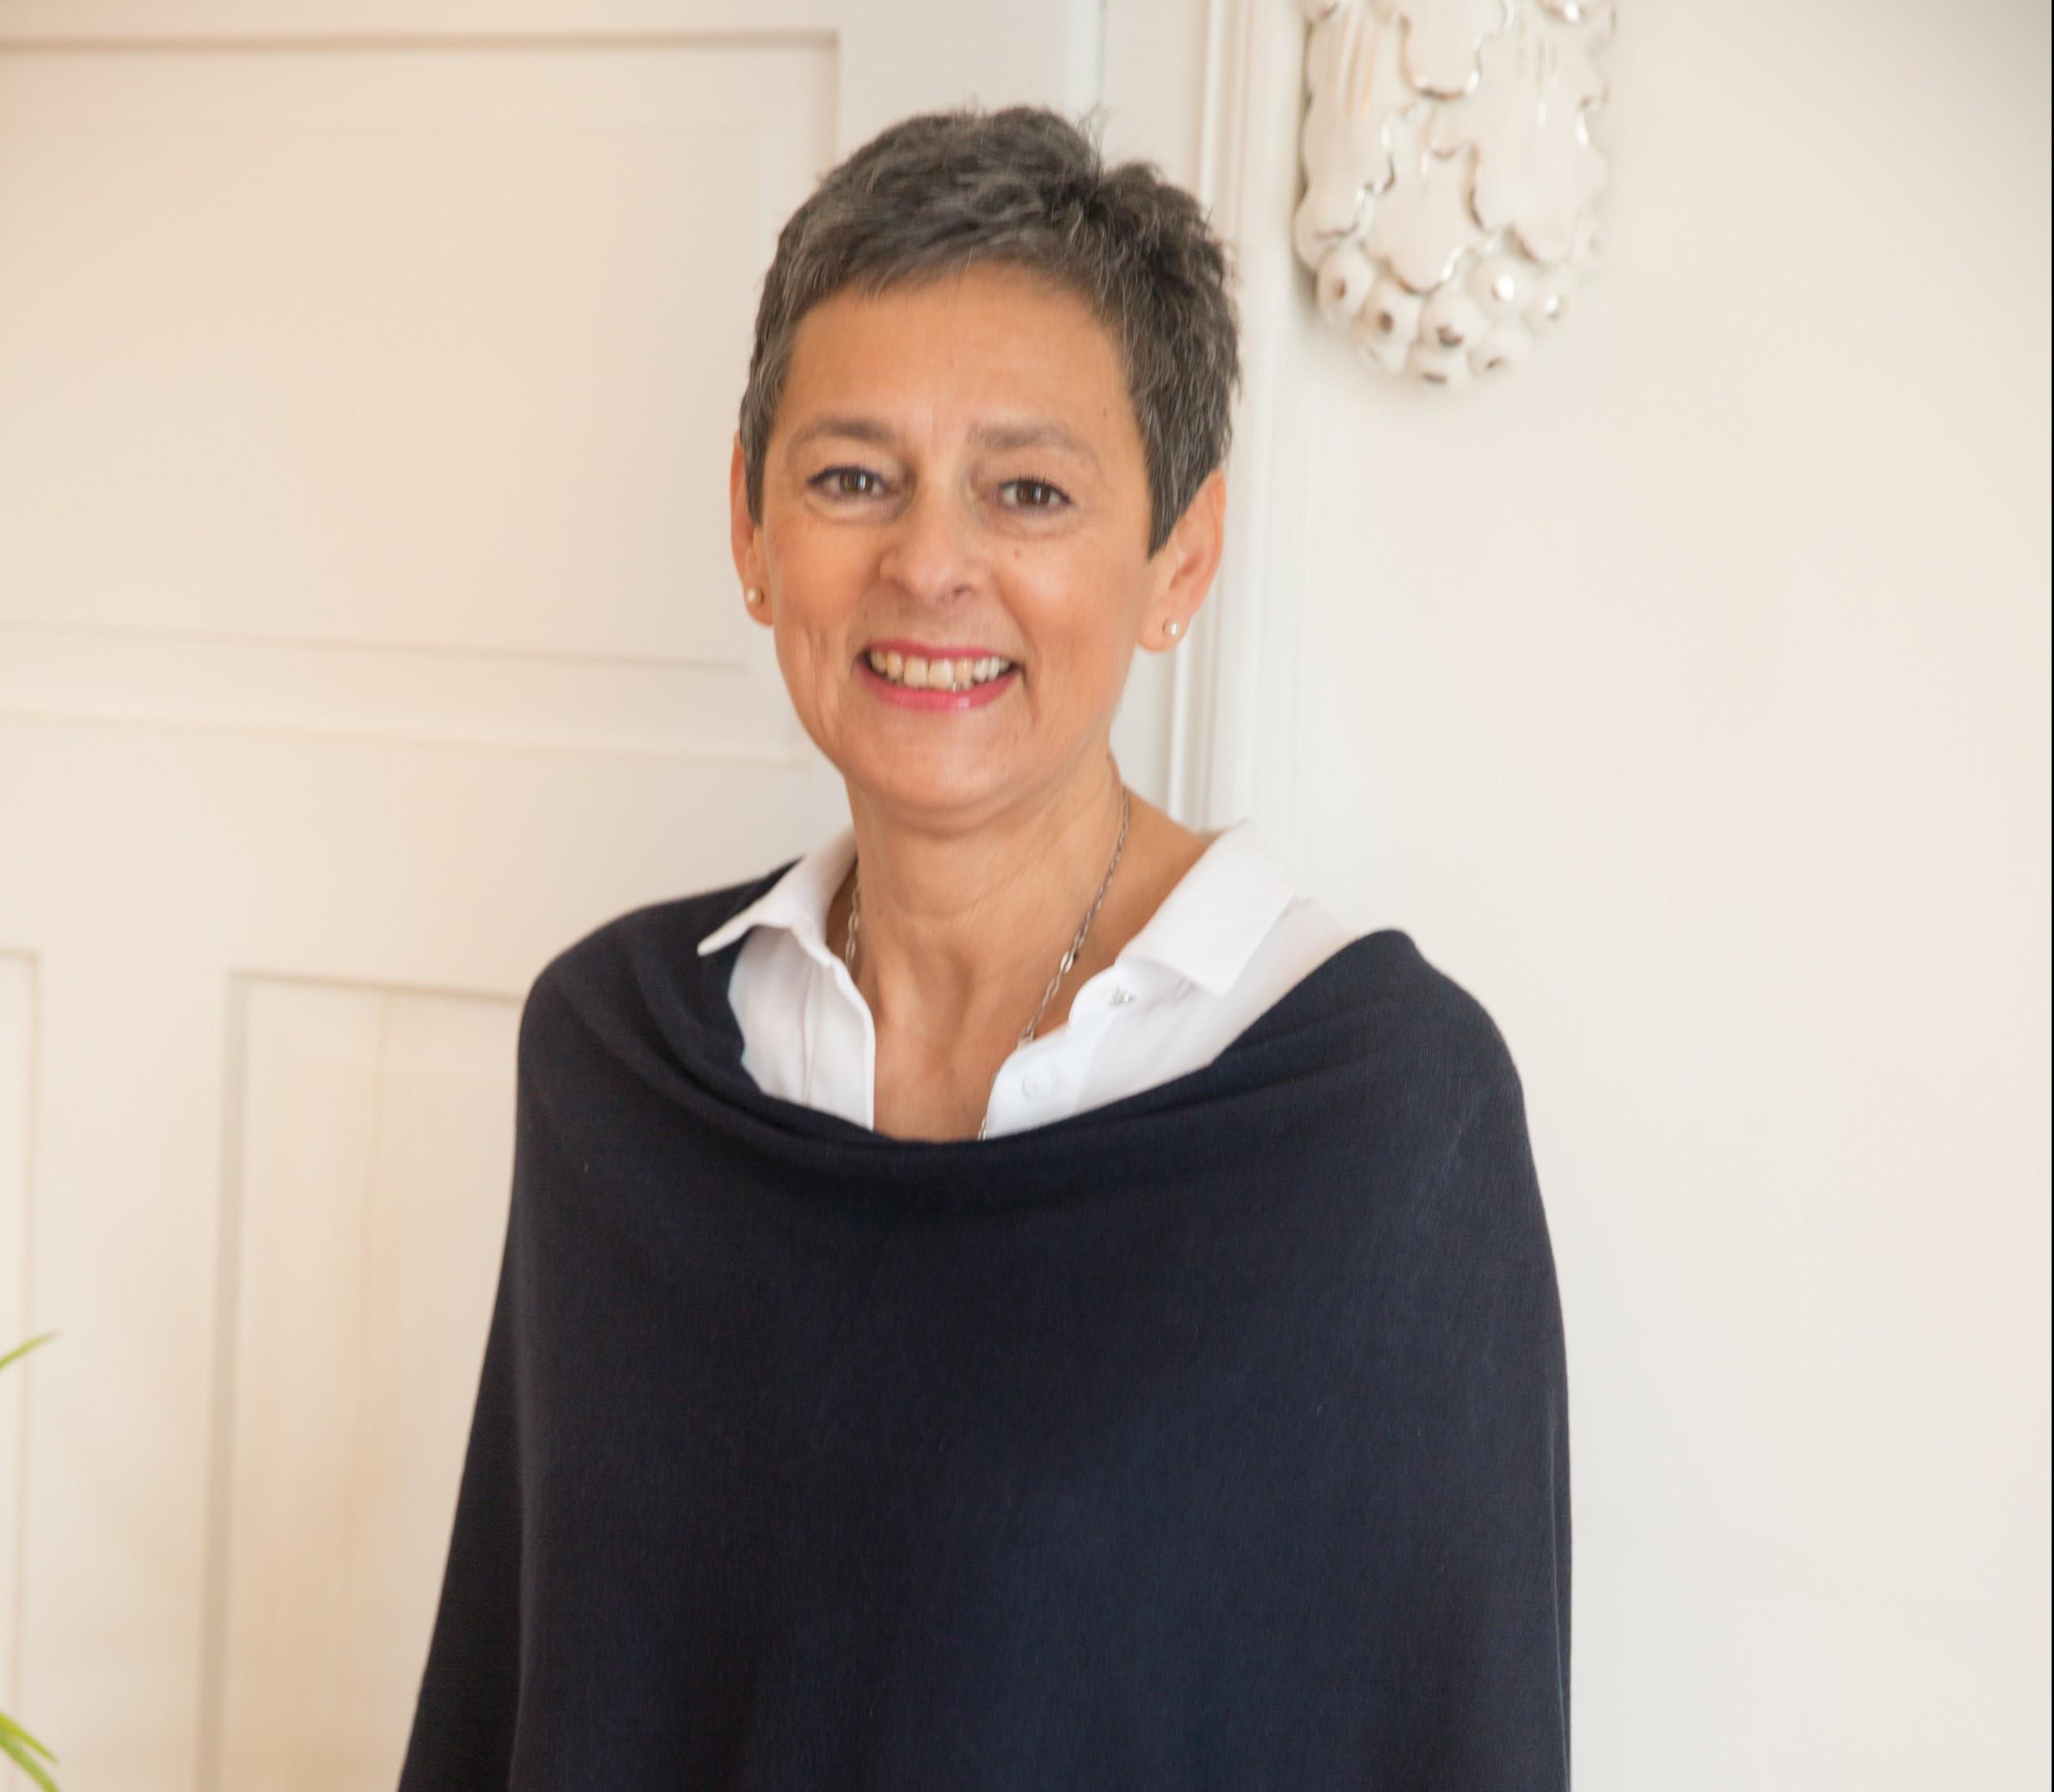 Maria Hinterholzer